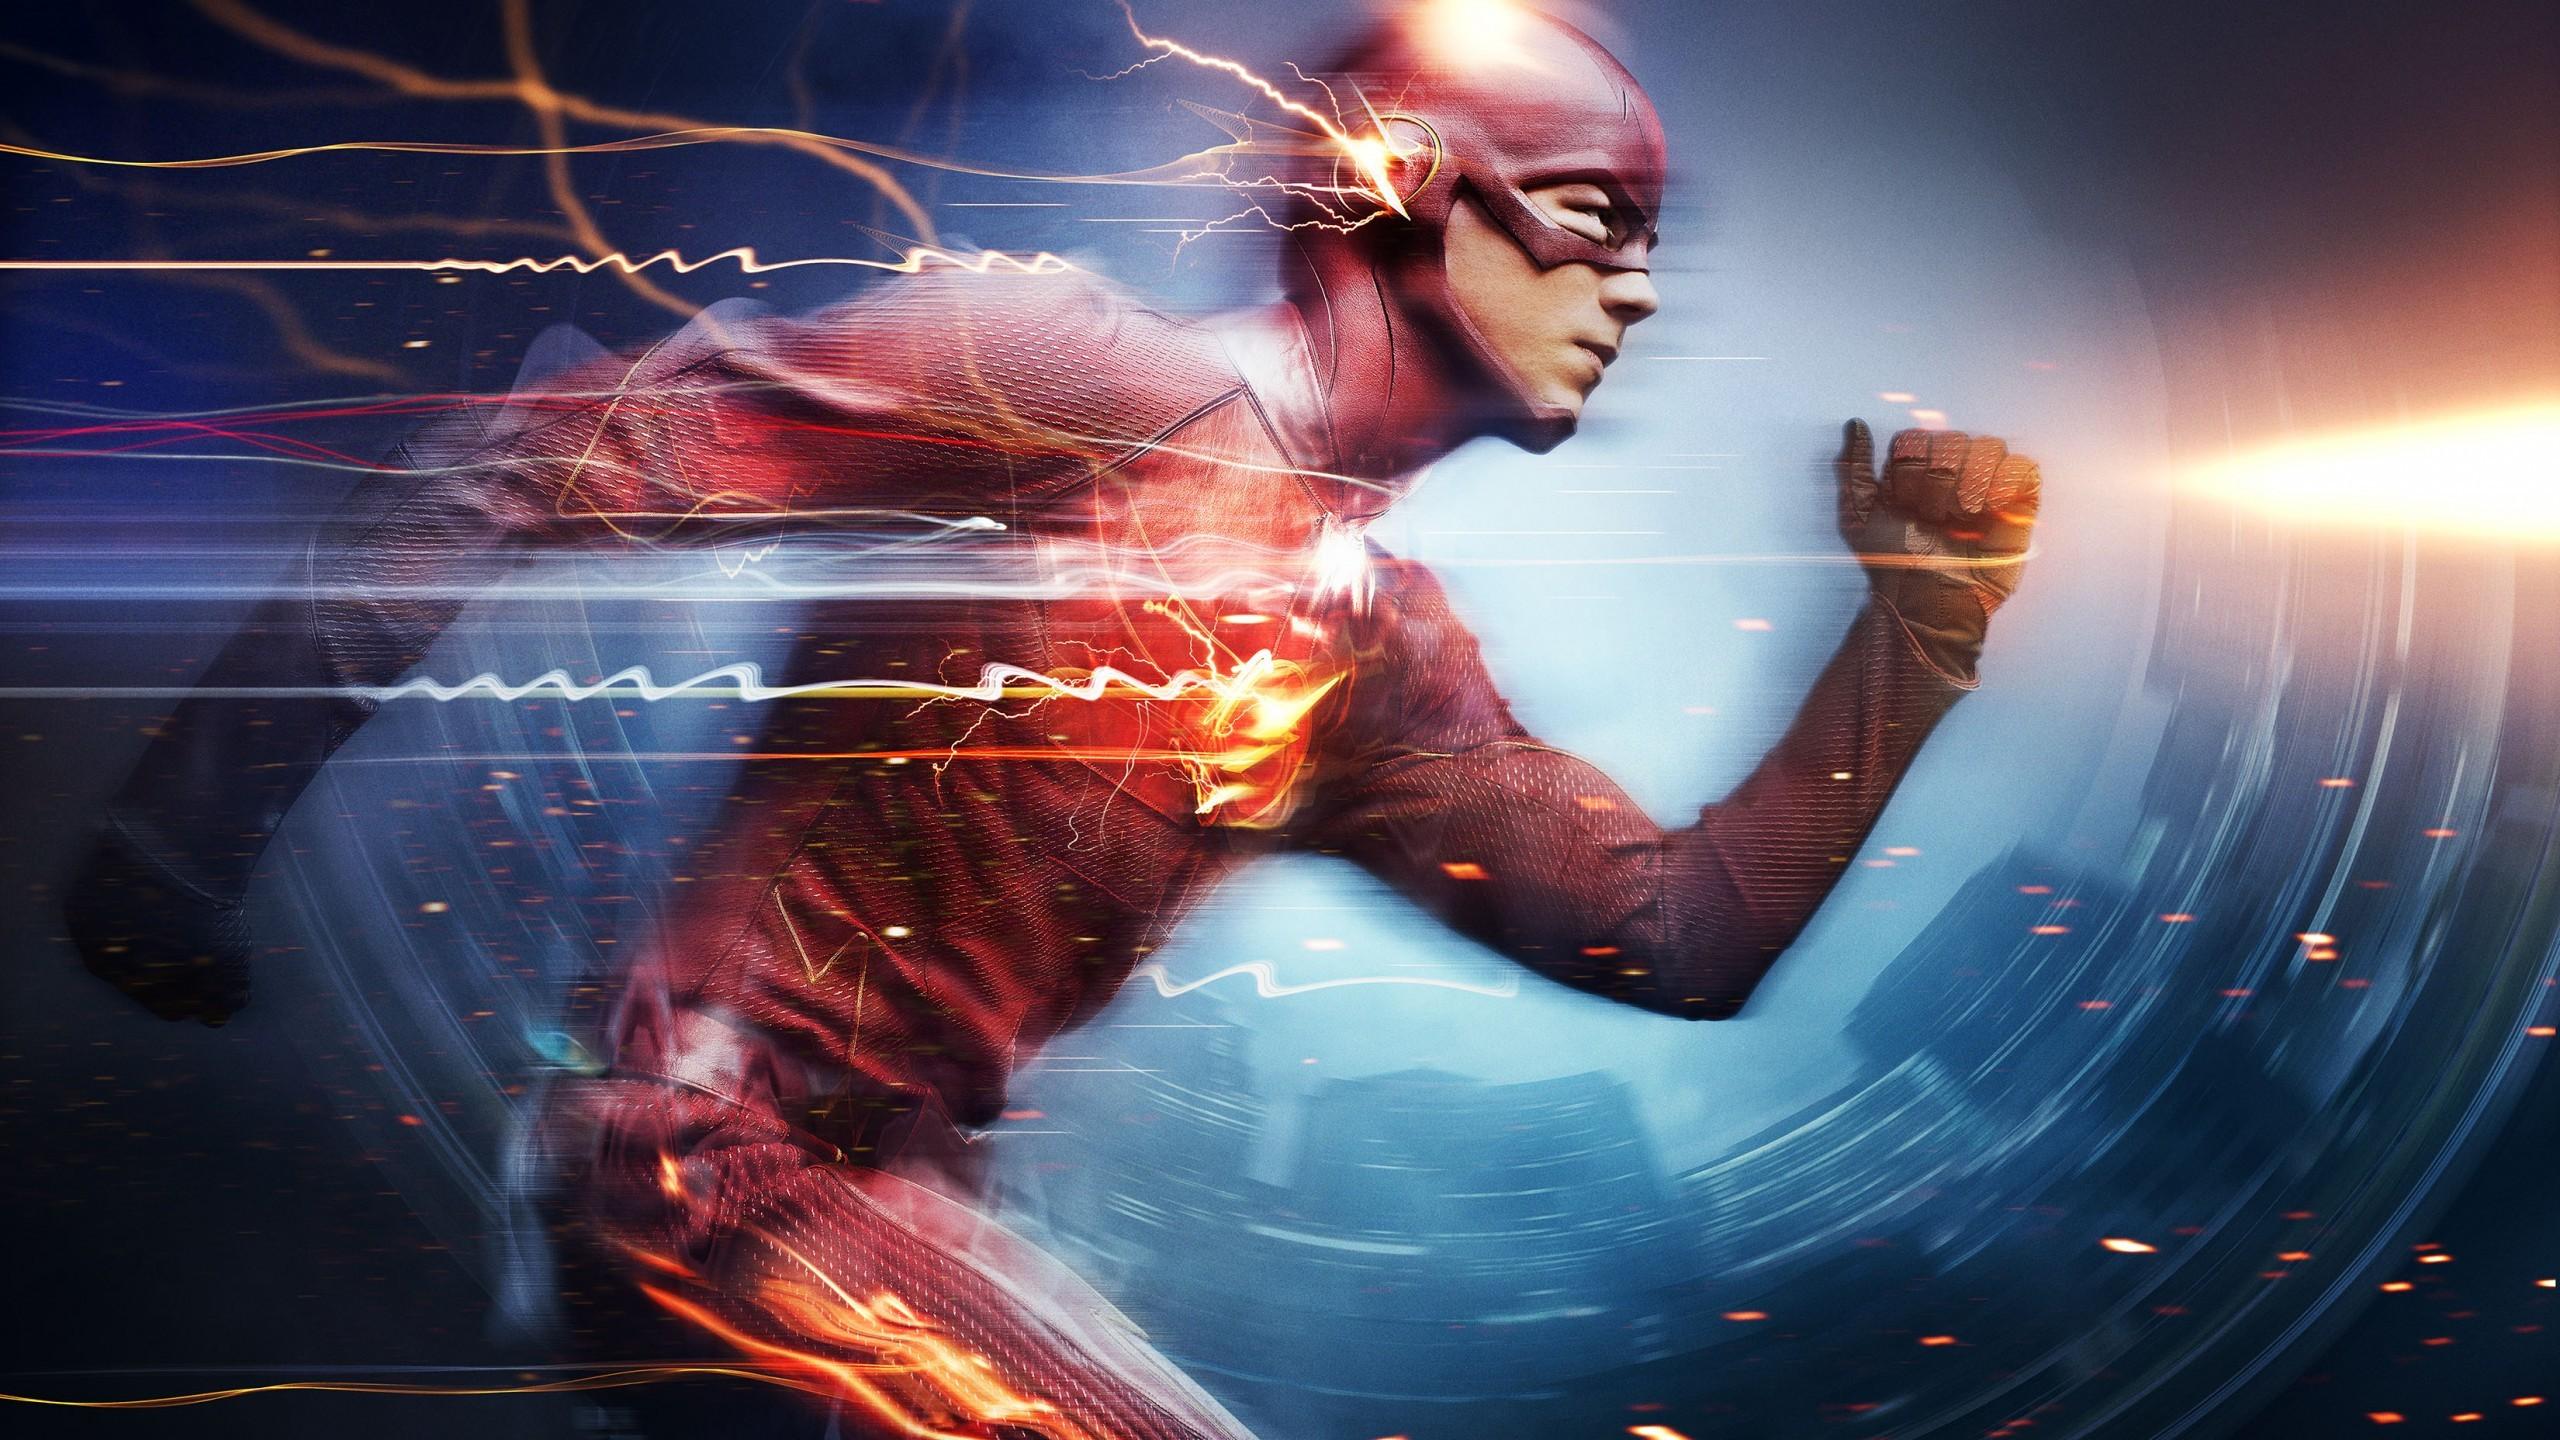 Tags: Grant Gustin, The Flash, HD